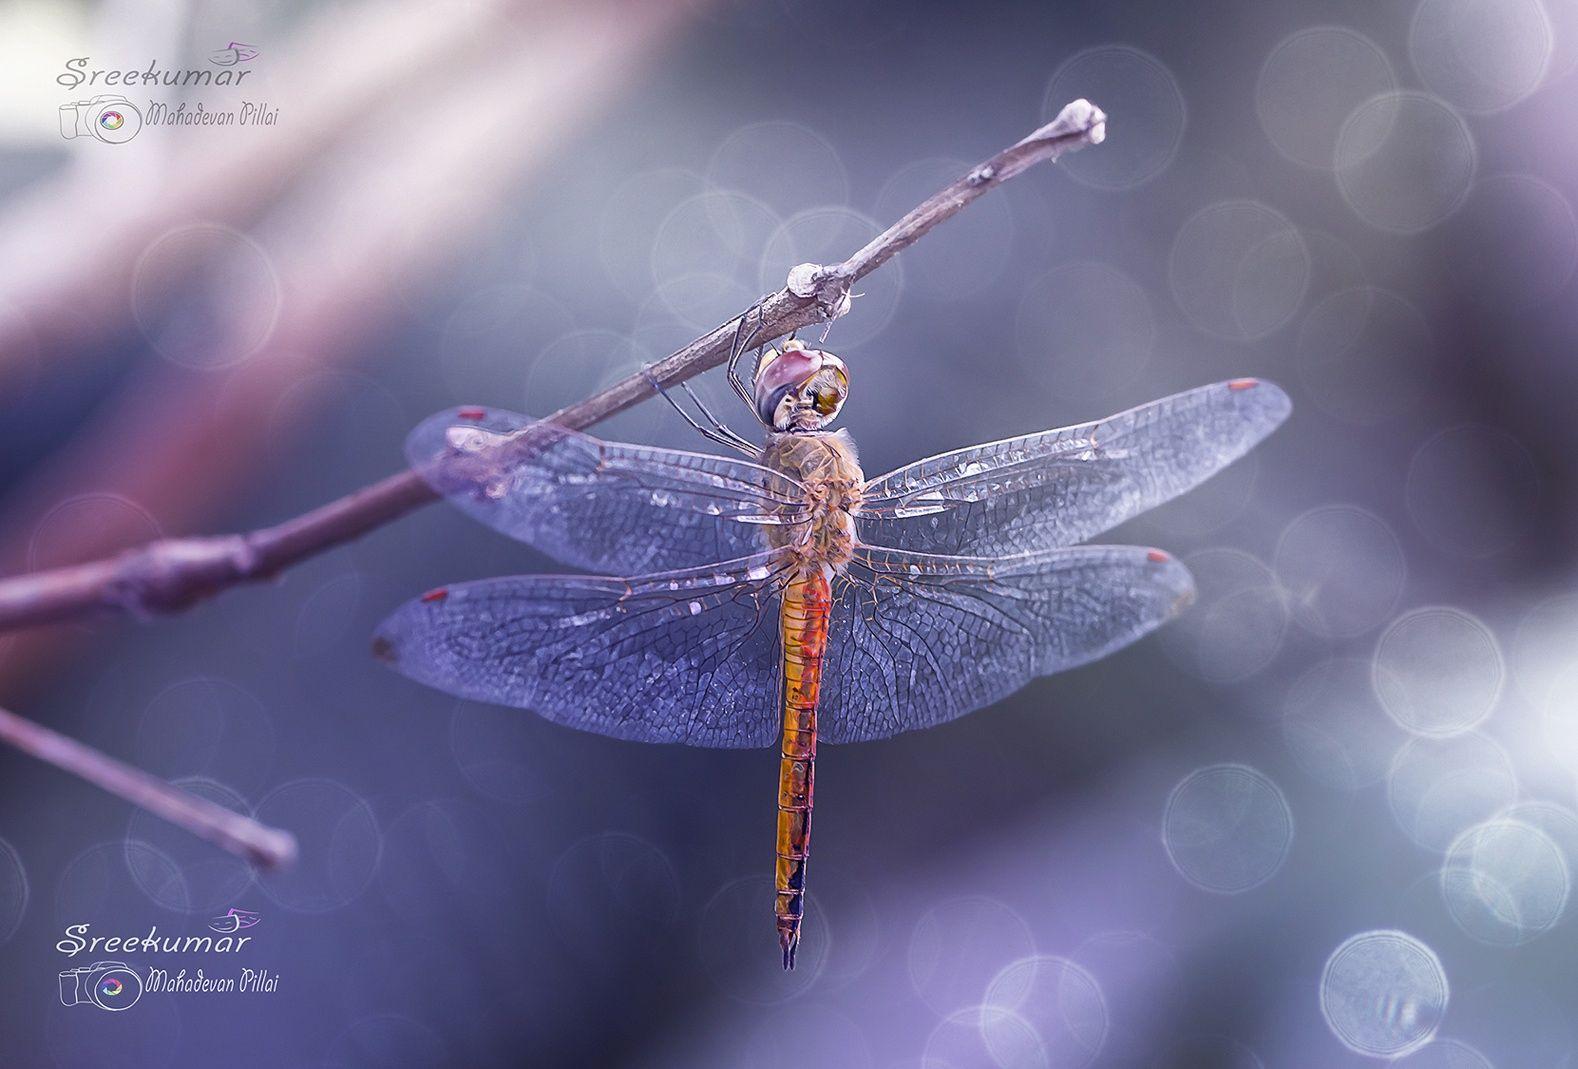 Dragon fly by Sreekumar Mahadevan Pillai on 500px